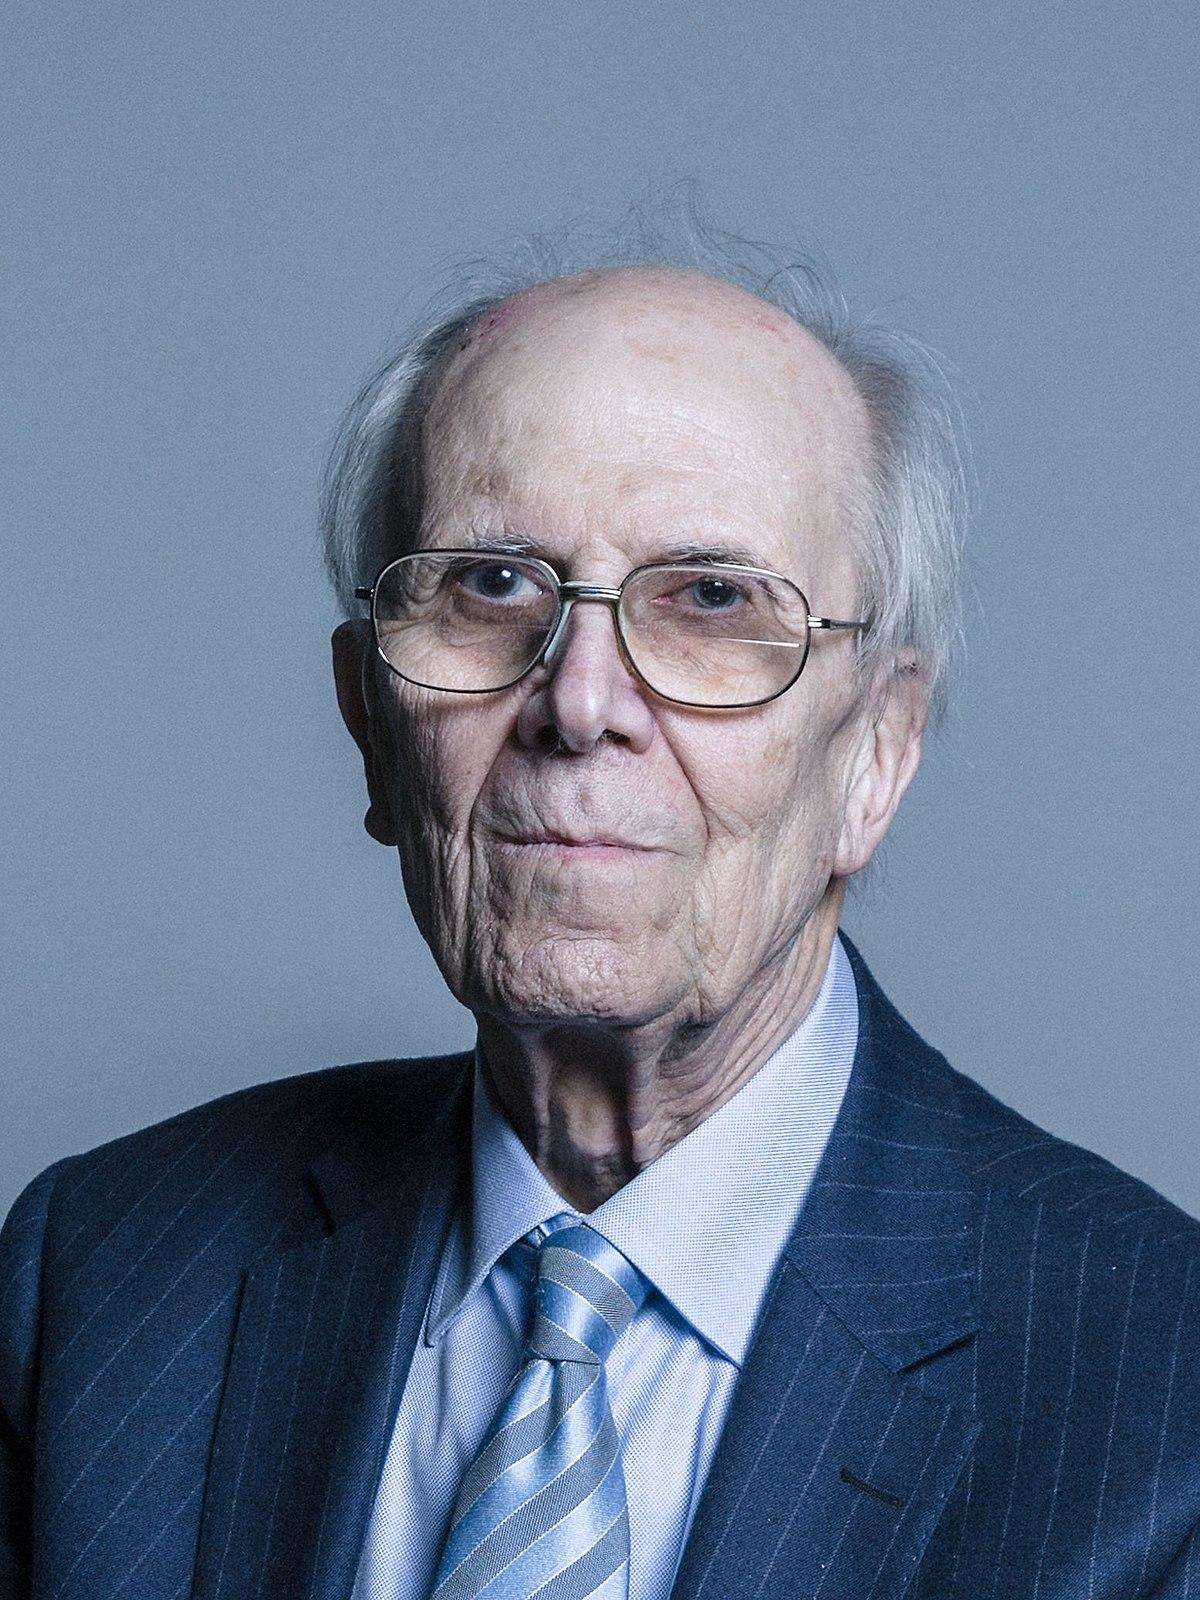 Norman Tebbit - Wikipedia